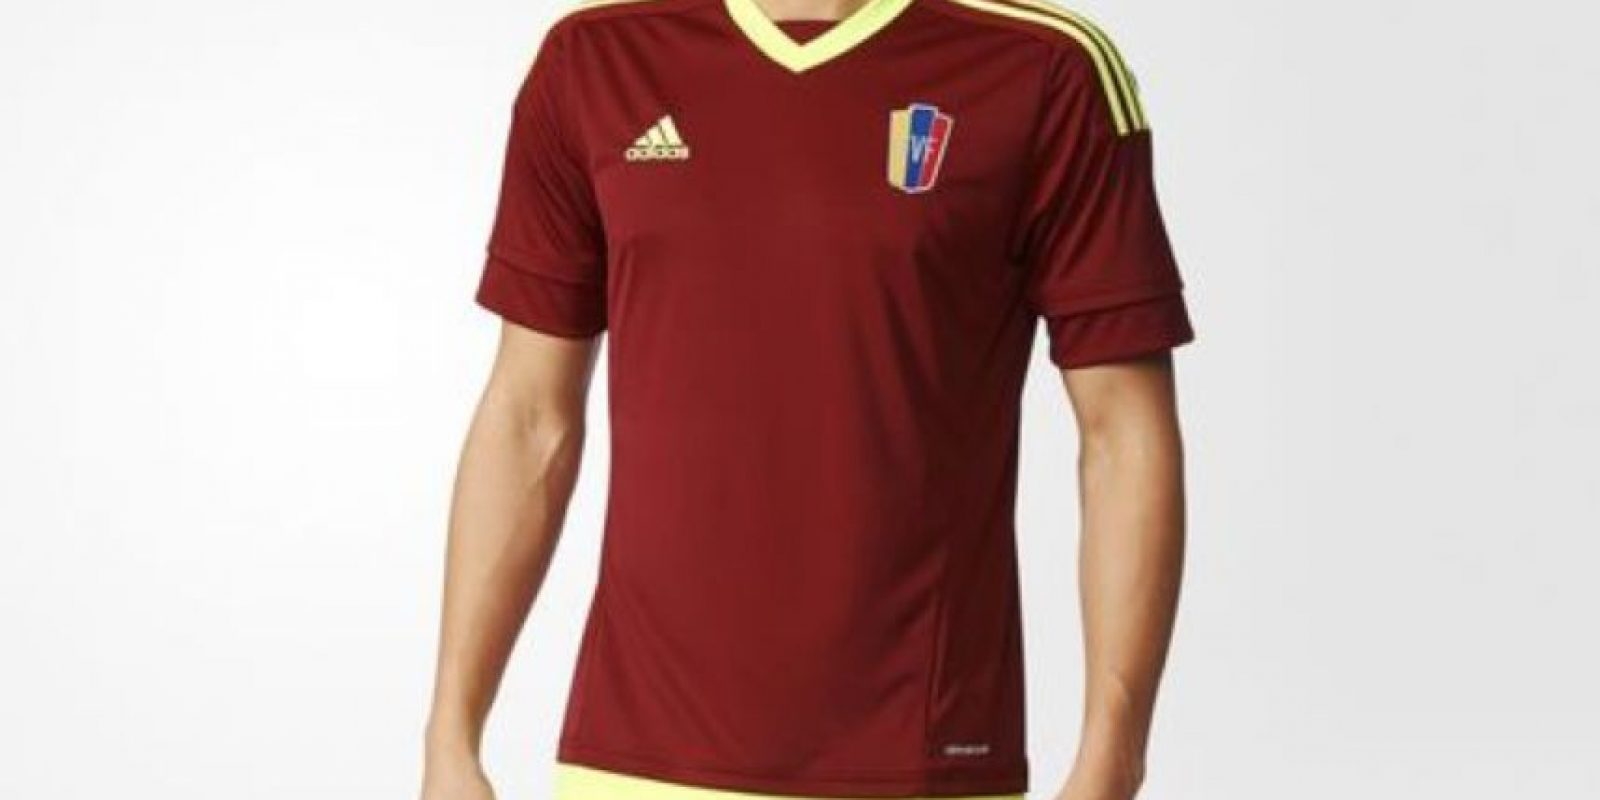 Foto:Tomado de http://www.adidas.co/camiseta-local-seleccion-venezolana-2014-2015/S08905.html